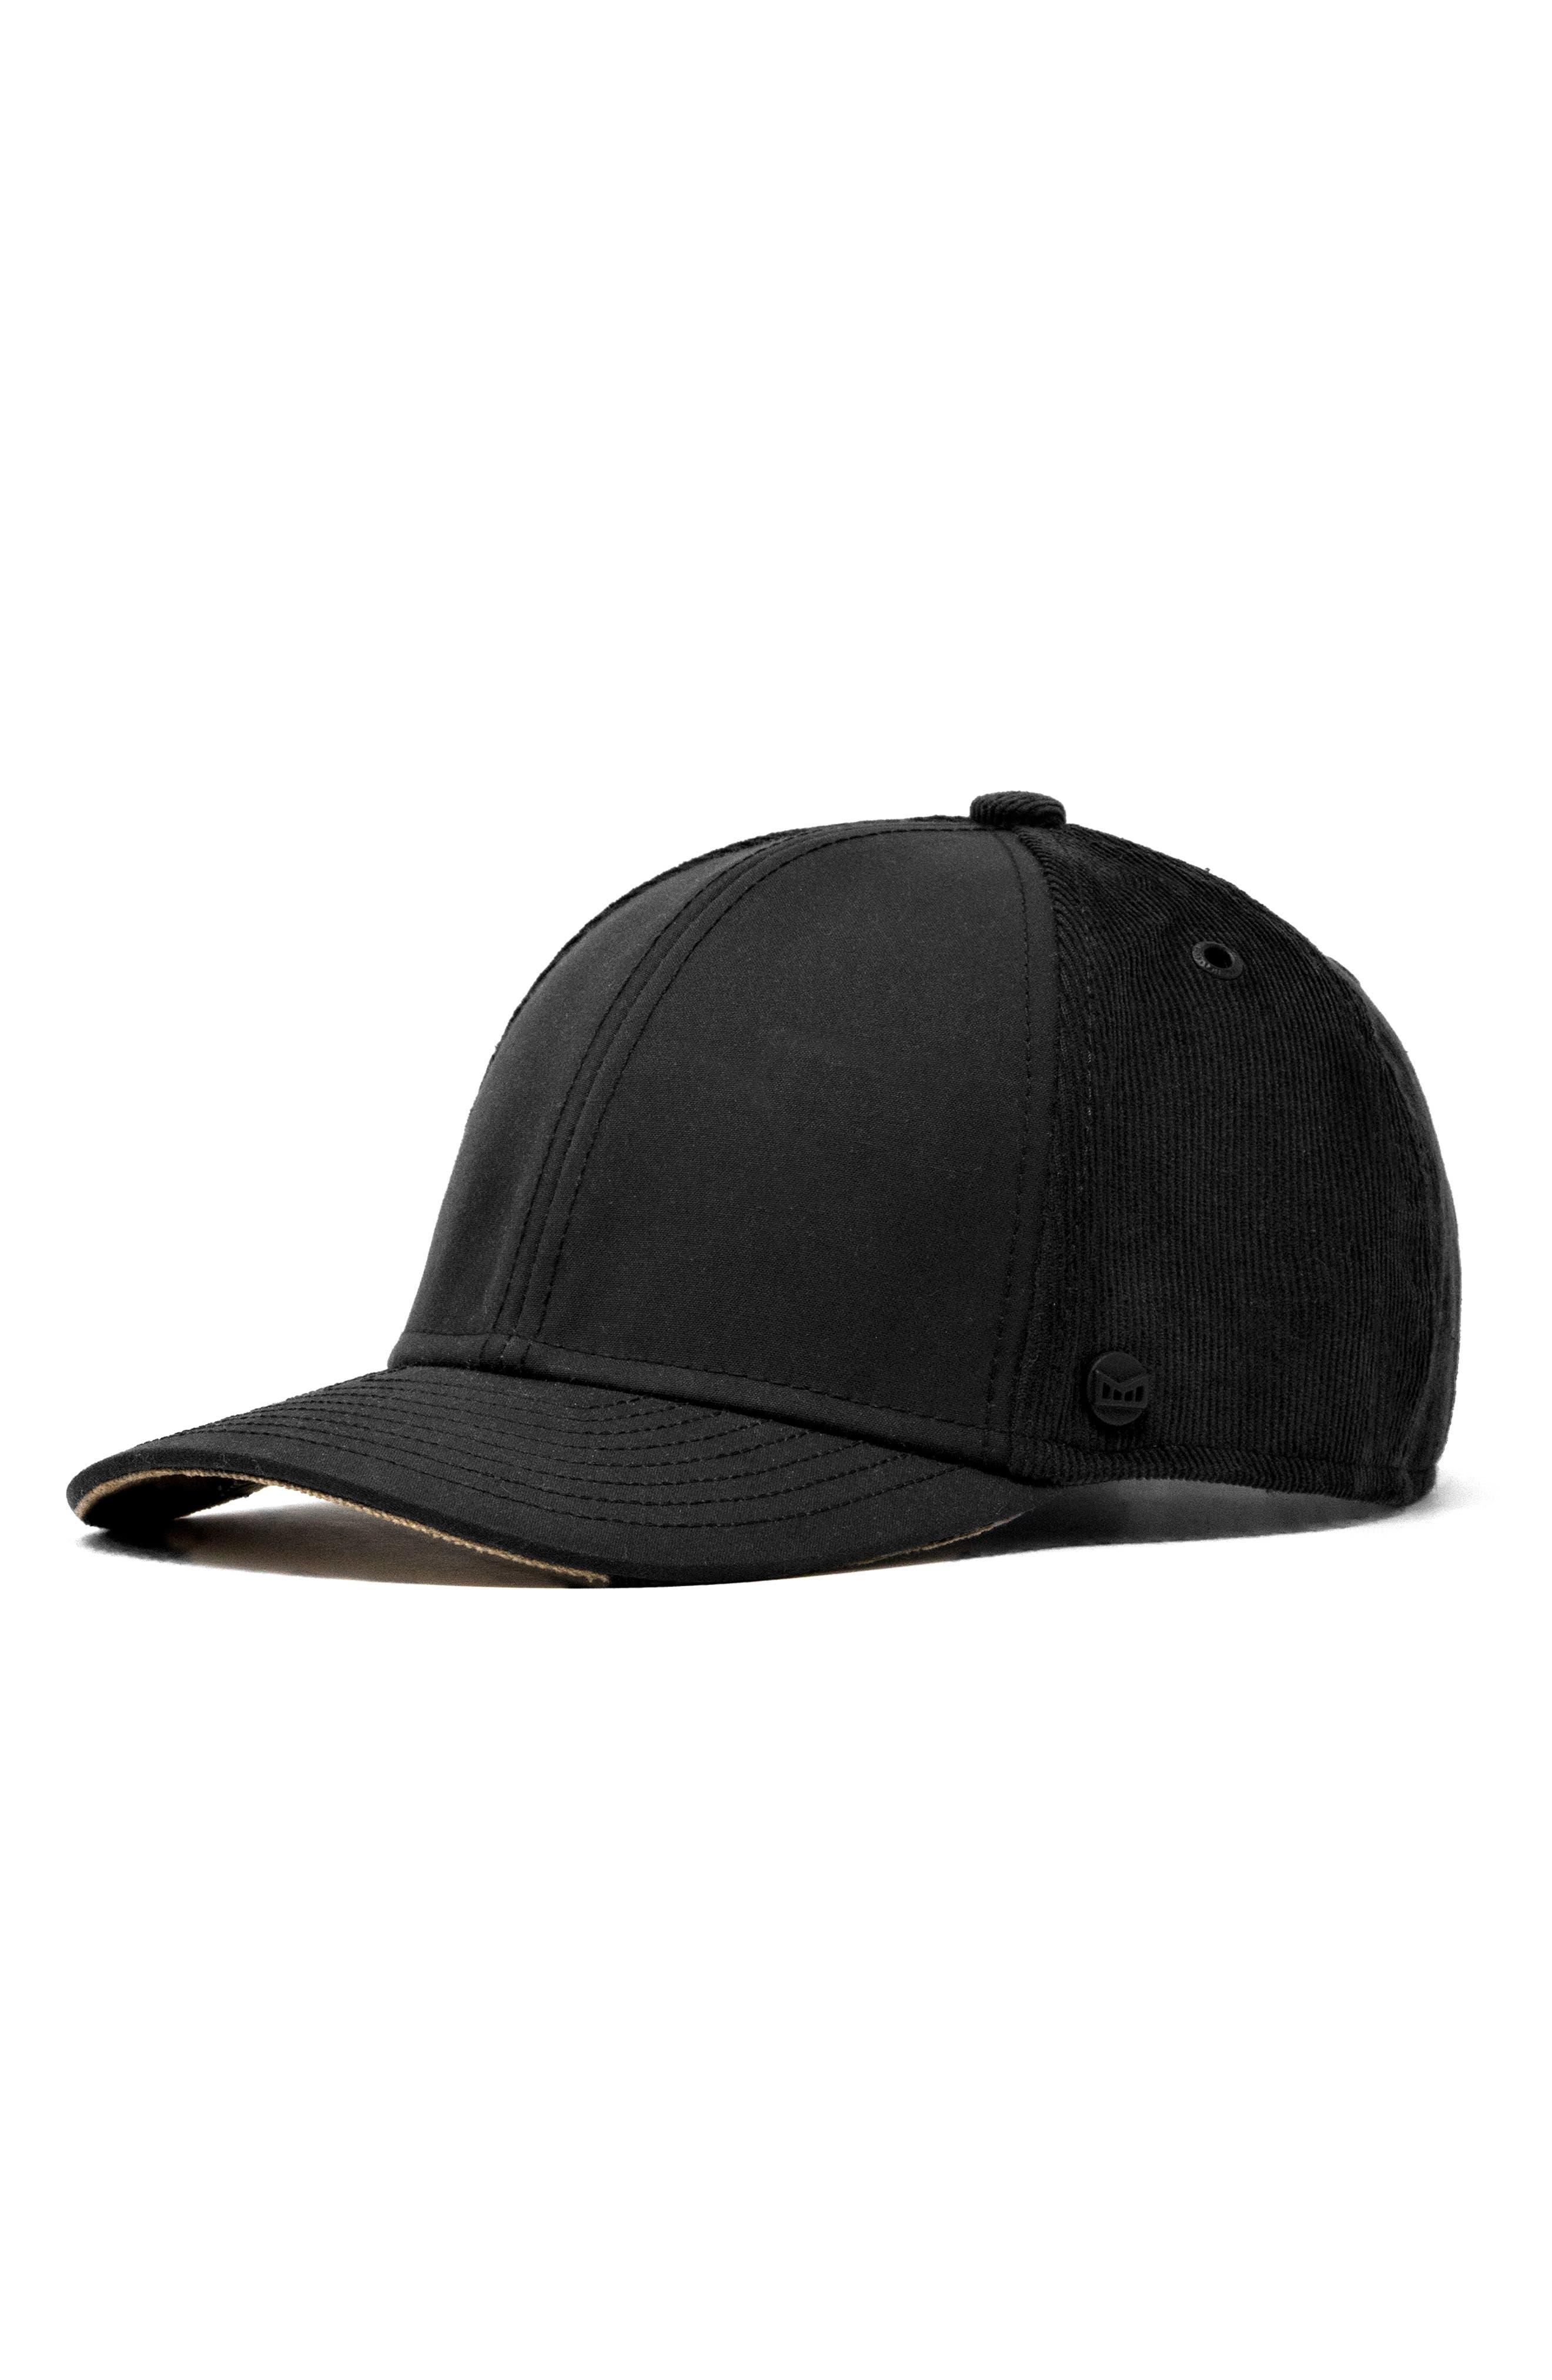 Discovery Baseball Cap,                             Main thumbnail 1, color,                             BLACK